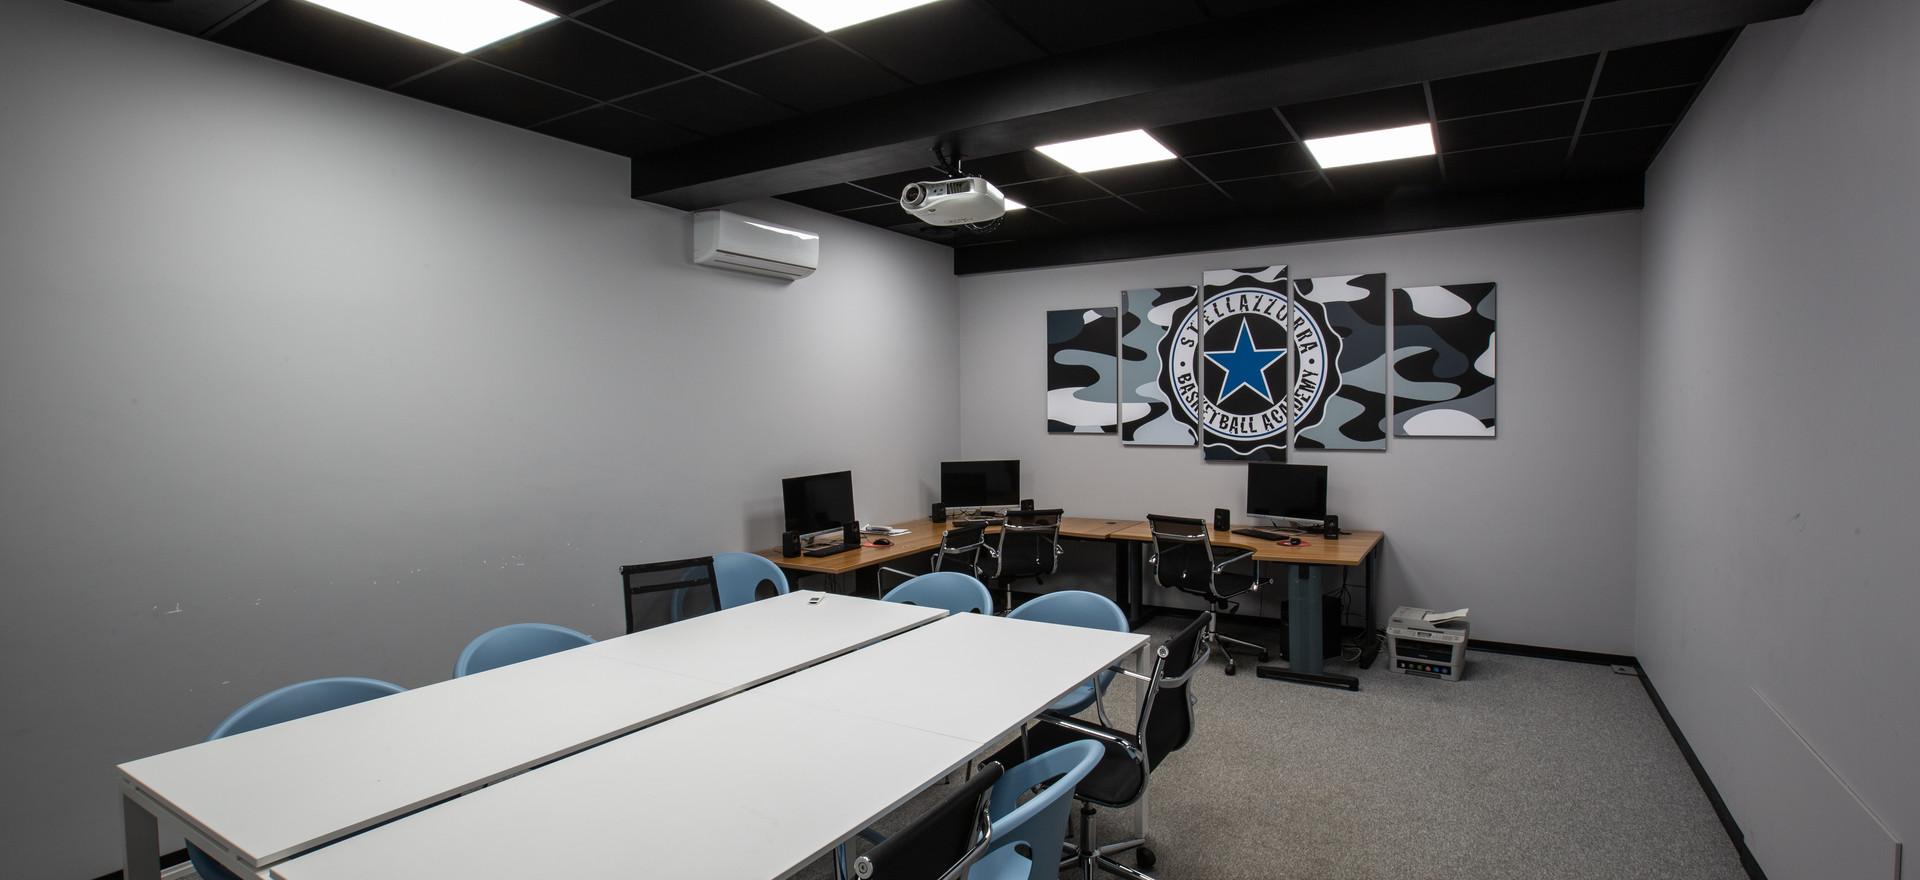 Aula studio.jpg